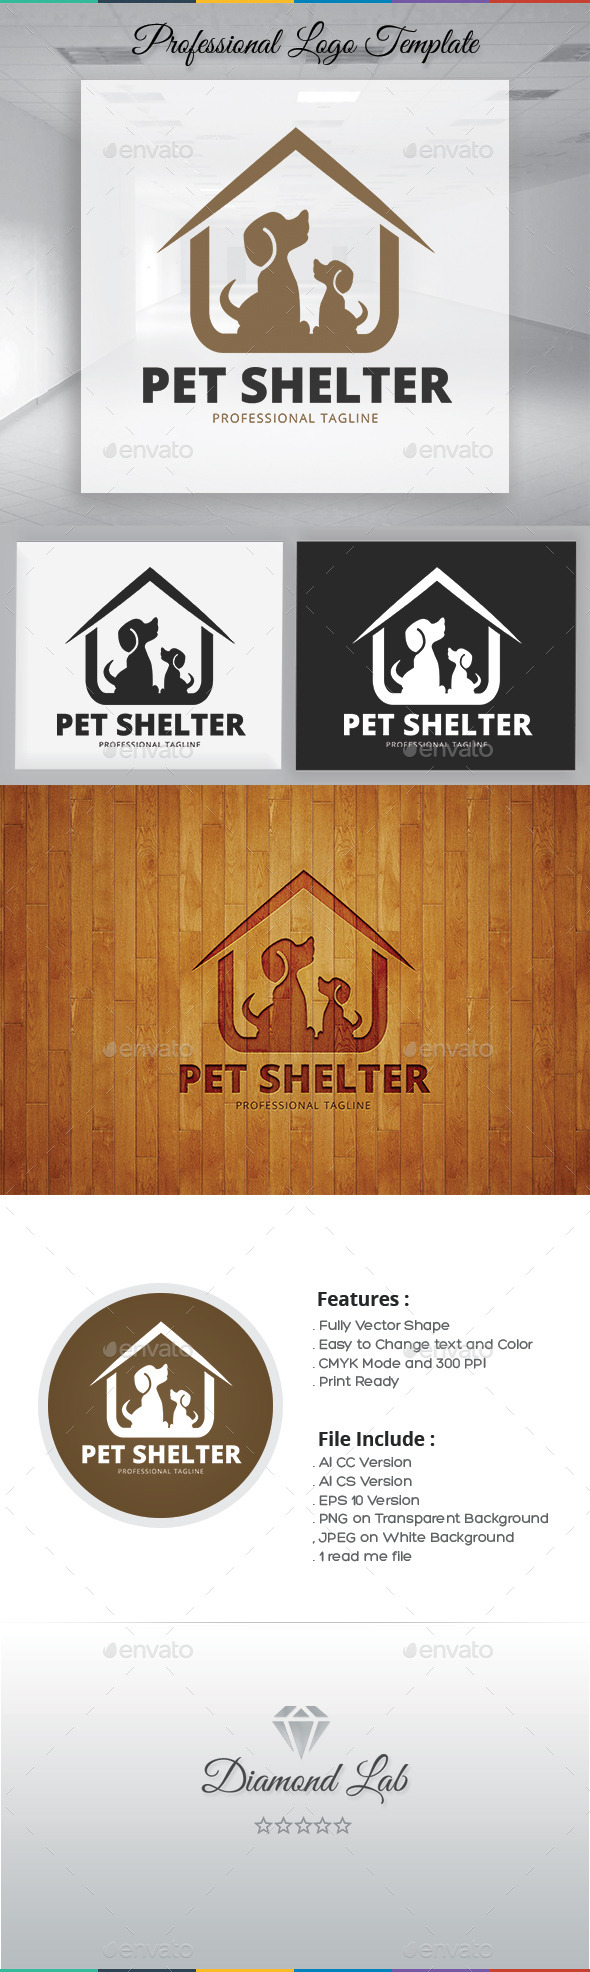 Pet Shelter Logo Template